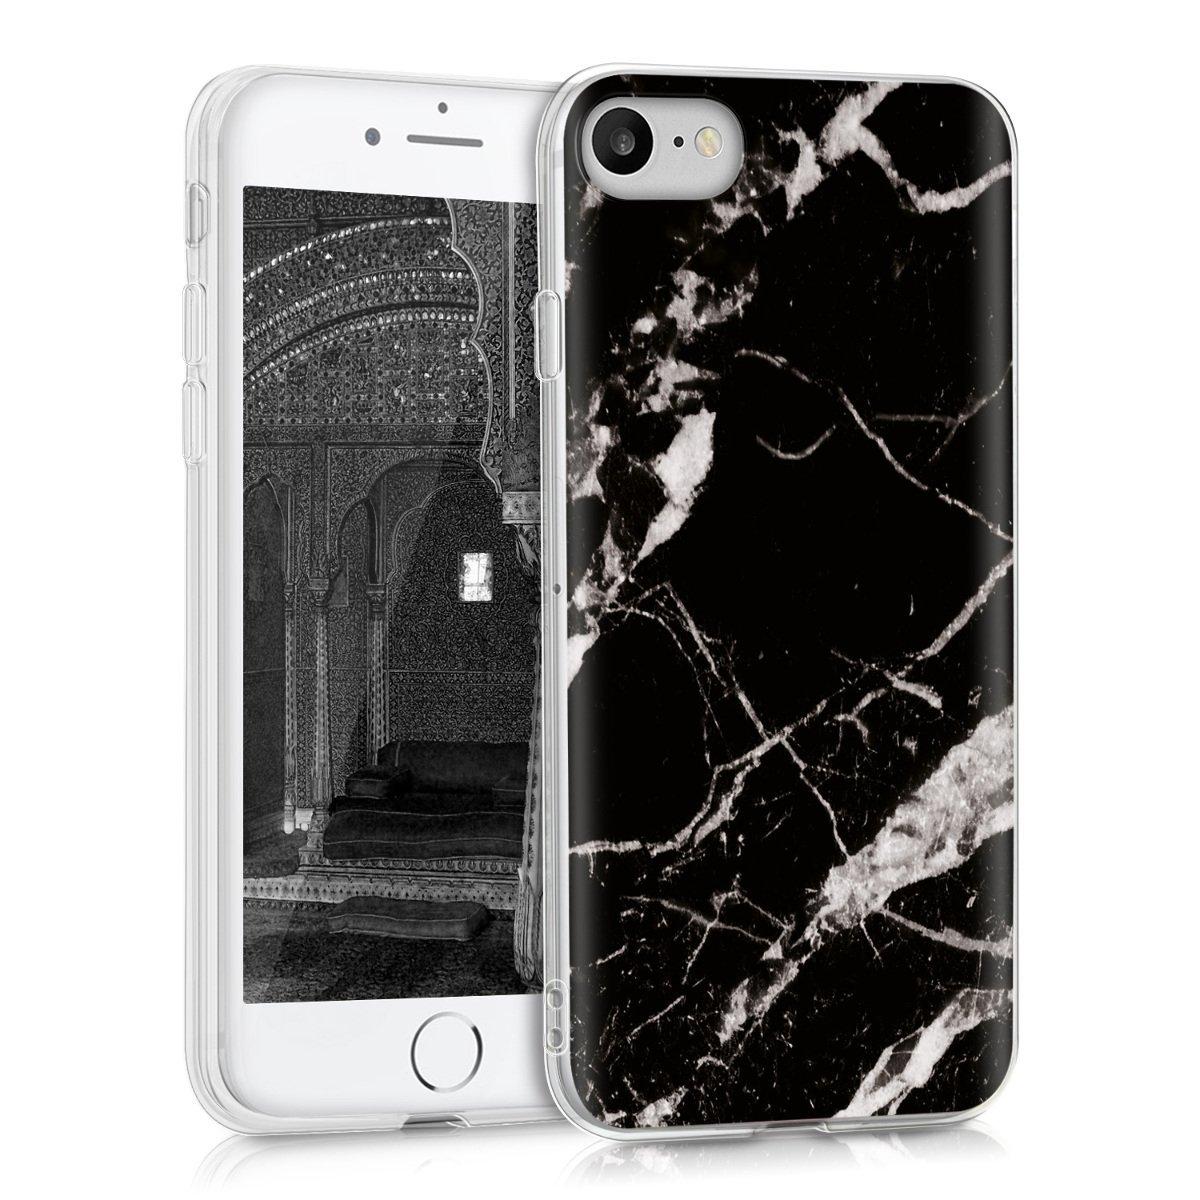 KW Θήκη Σιλικόνης iPhone  8 / 7 - Marble (39459.05)